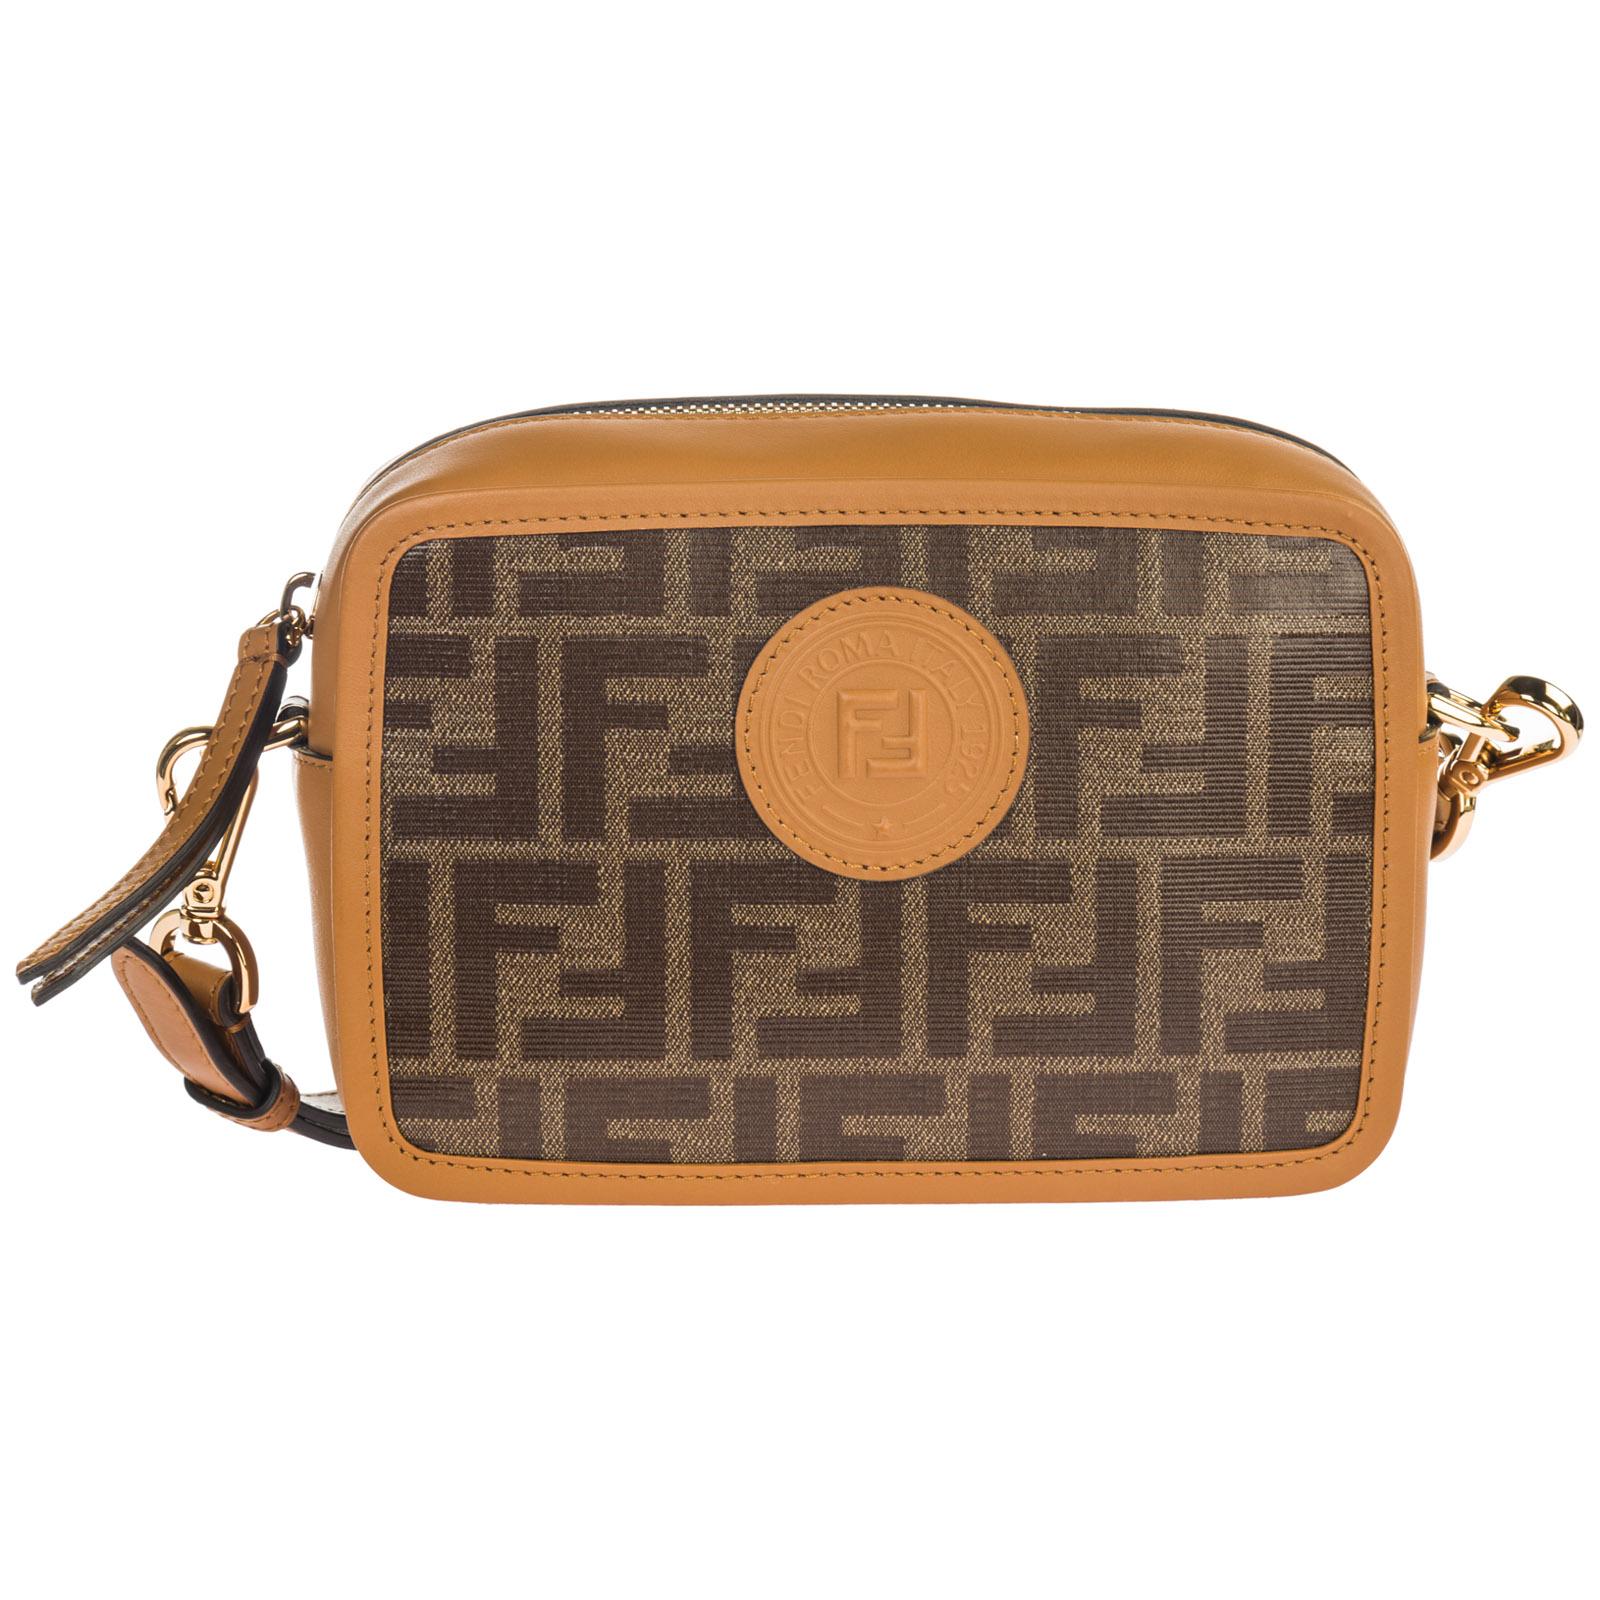 39b72f52e7c7 Fendi Women s Leather Cross-Body Messenger Shoulder Bag In Brown ...